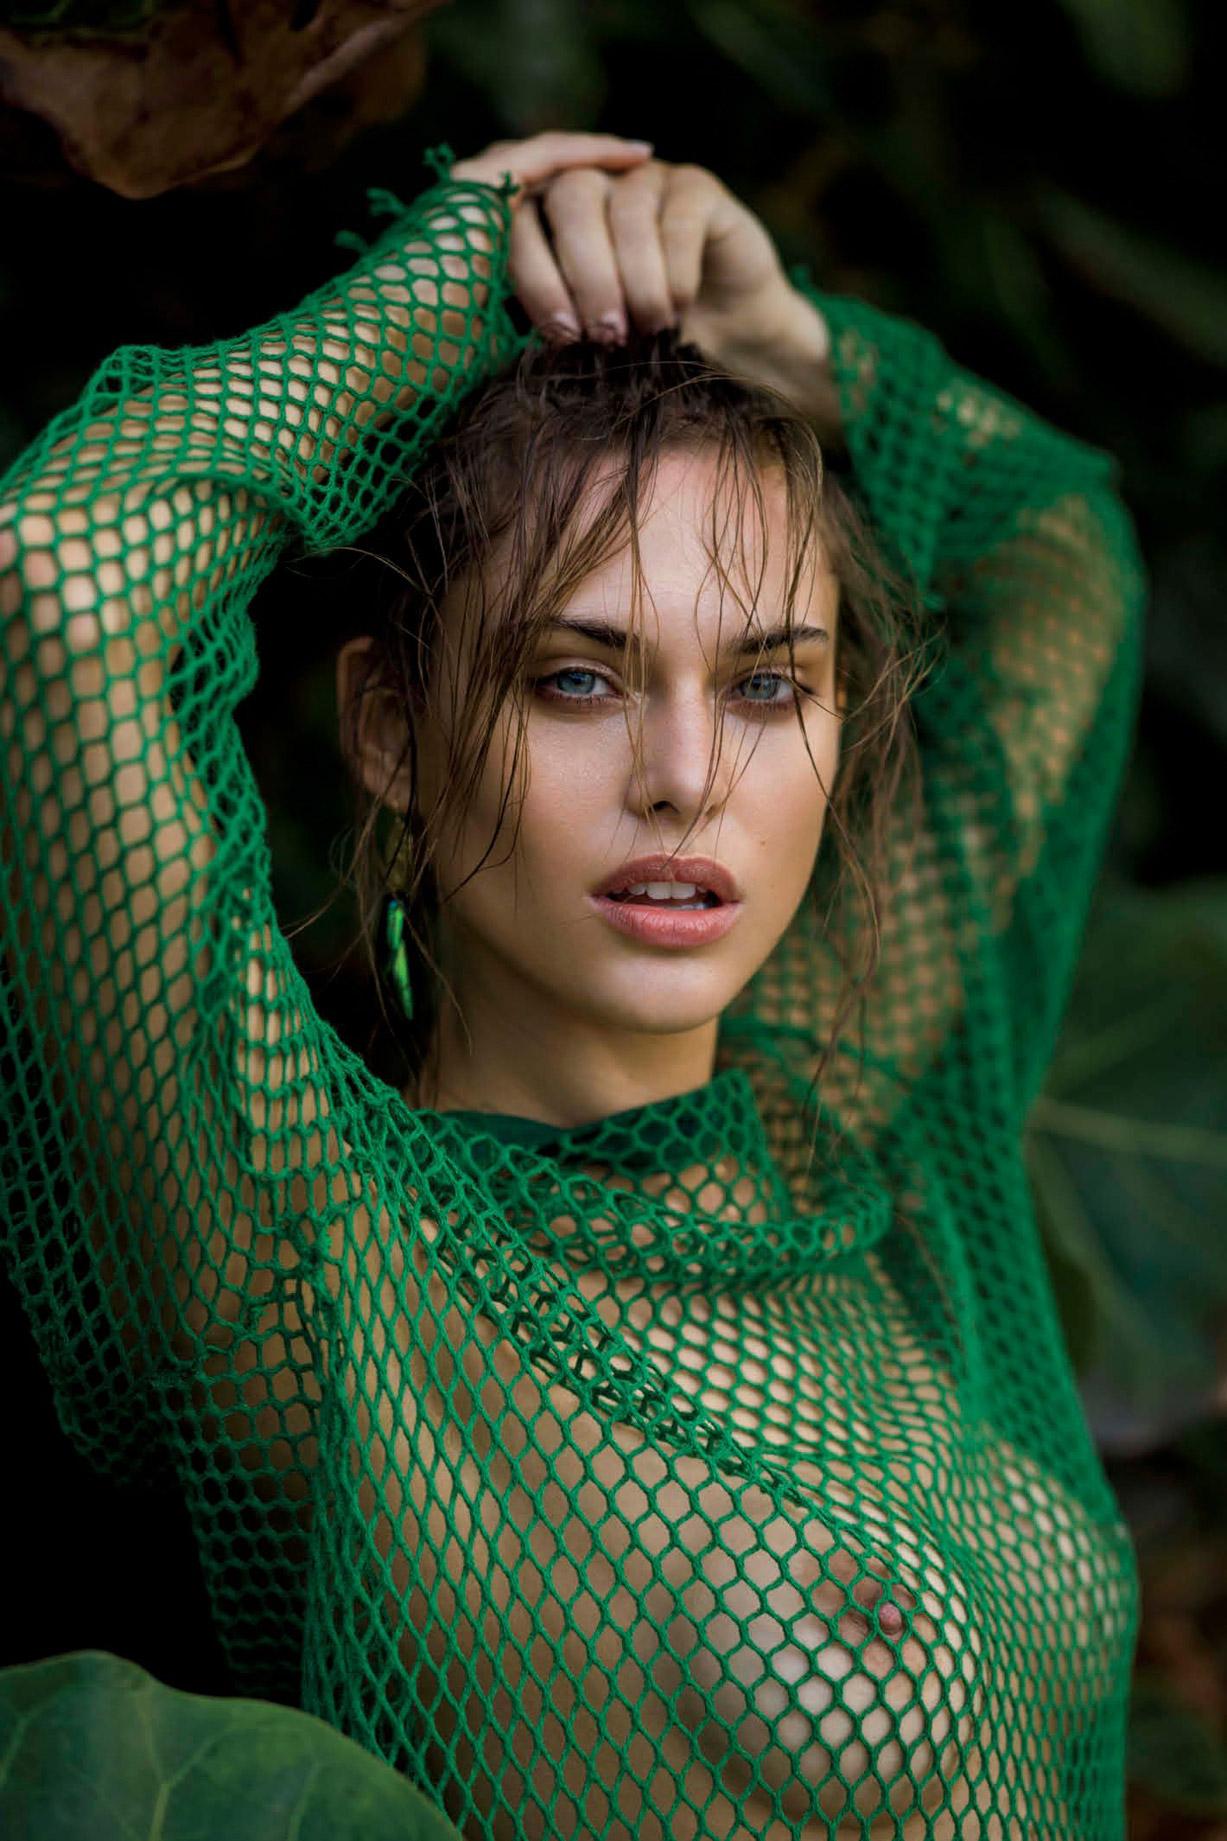 Лана Закосела / Lana Zakocela by Gilles Bensimon - Maxim US may 2017